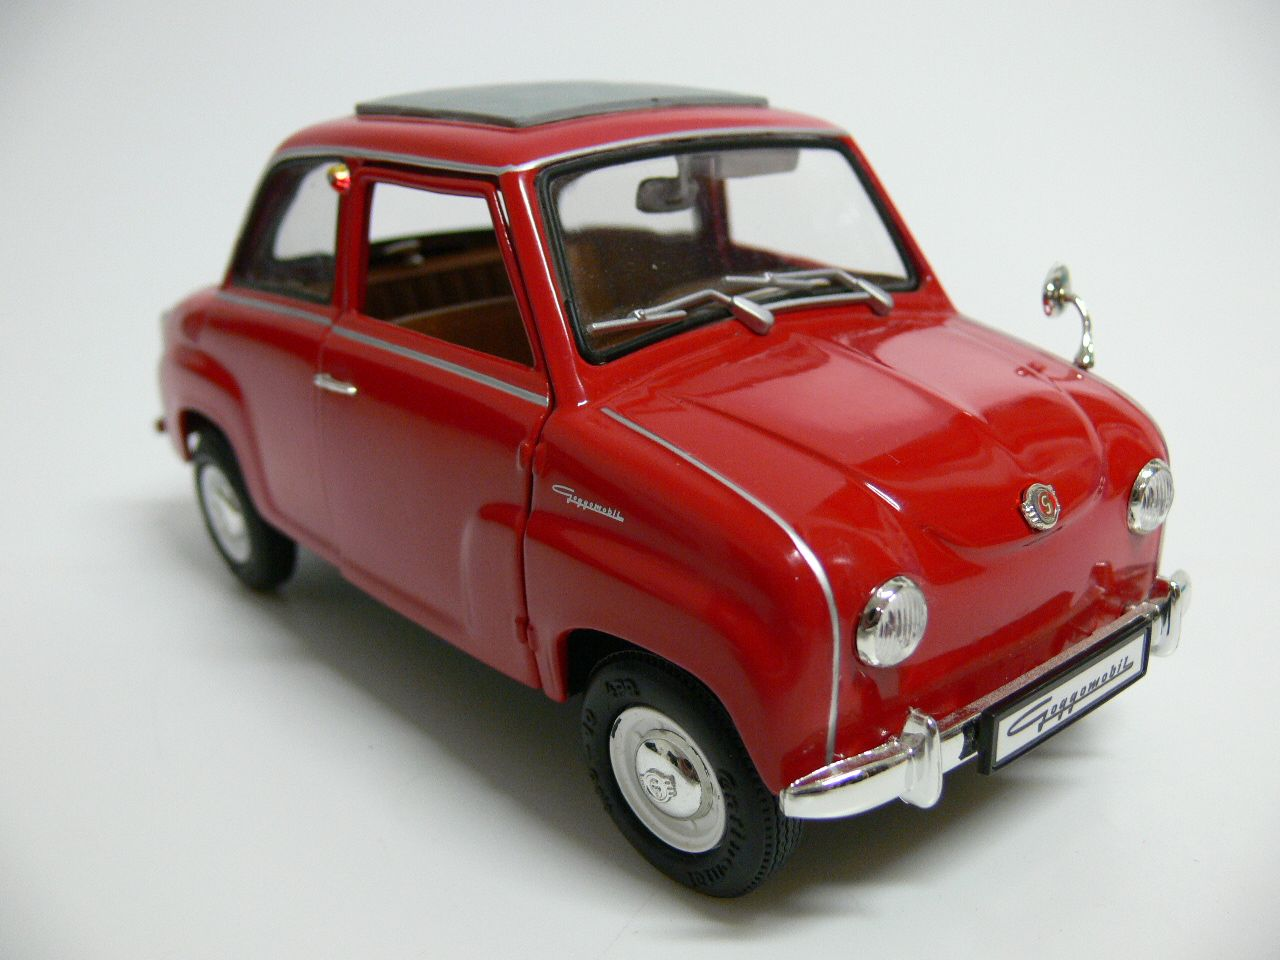 1997 Goggomobil | cute vehicles | Pinterest | Cars and Car pics